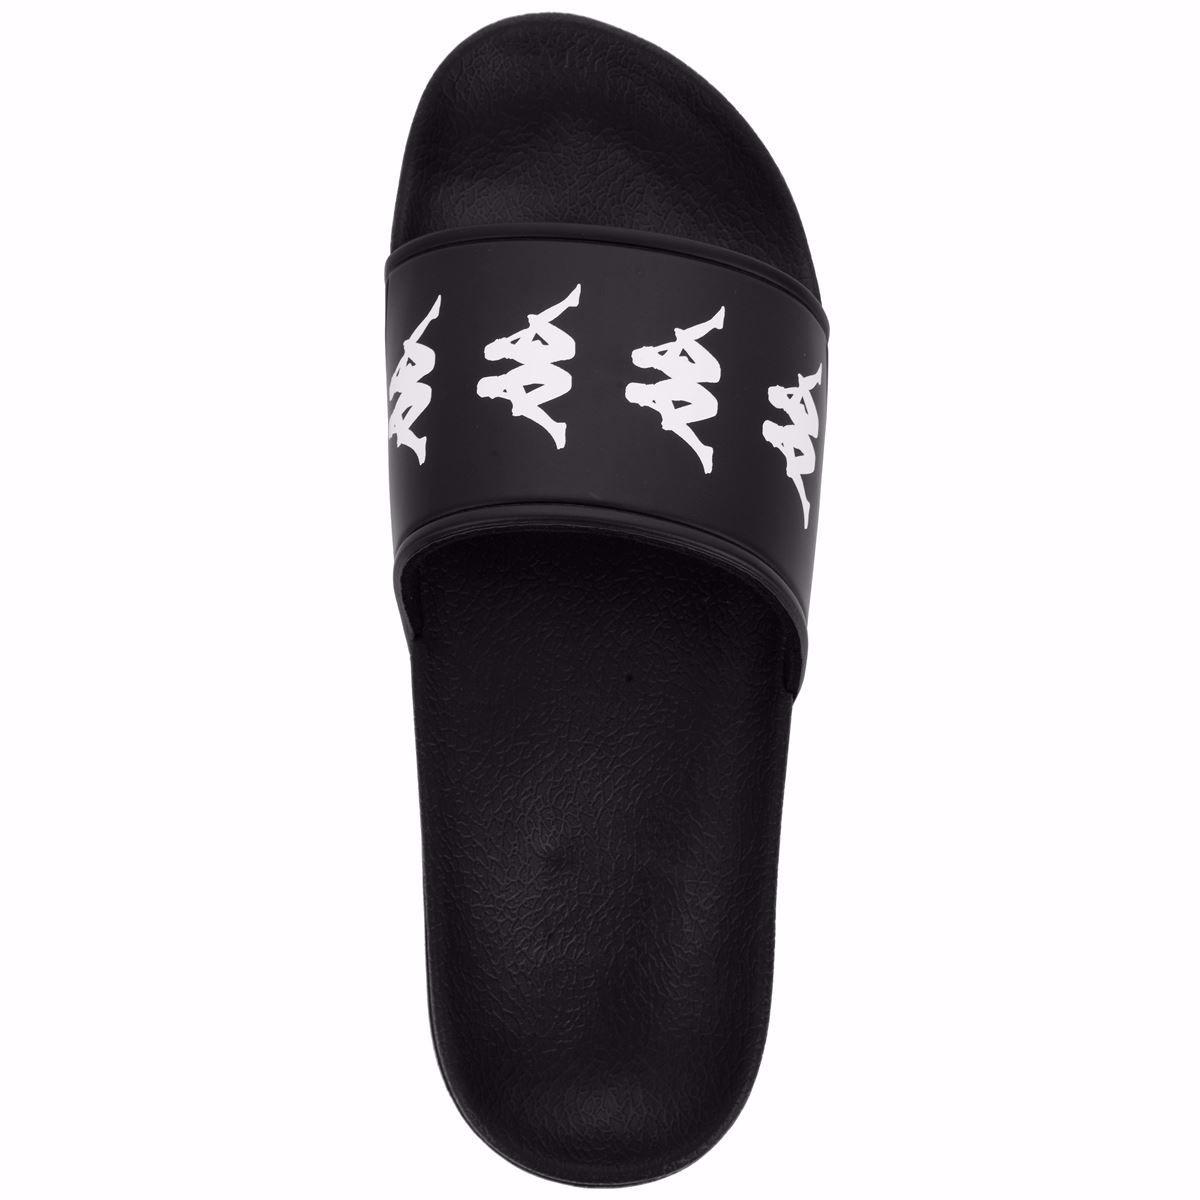 Kappa Flip Flops 304SQXO 900 Black